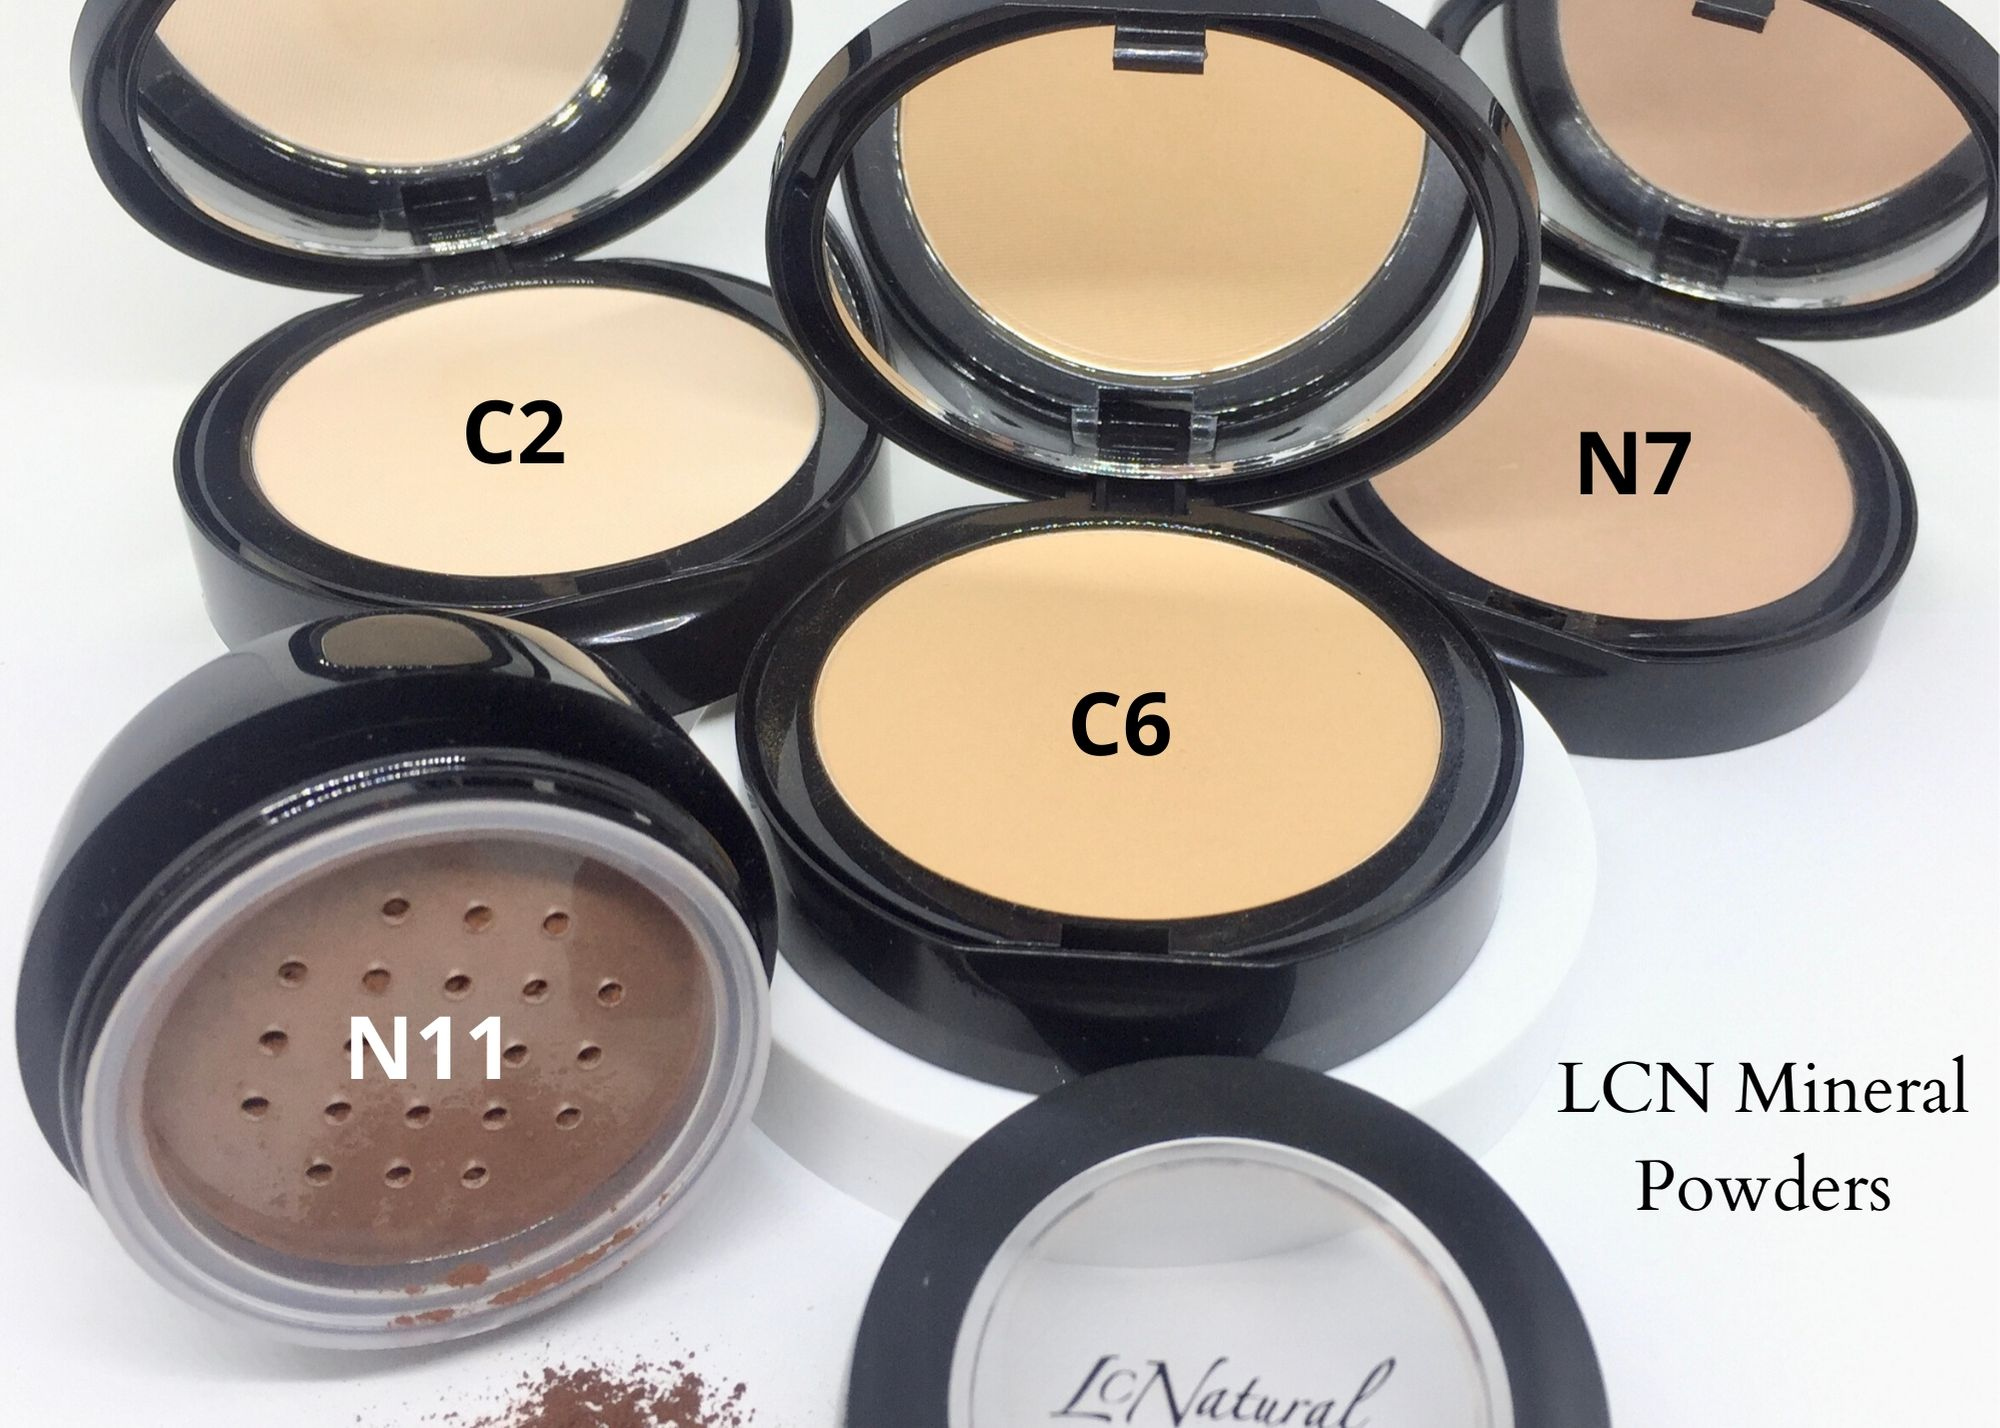 LCN Mineral Powder